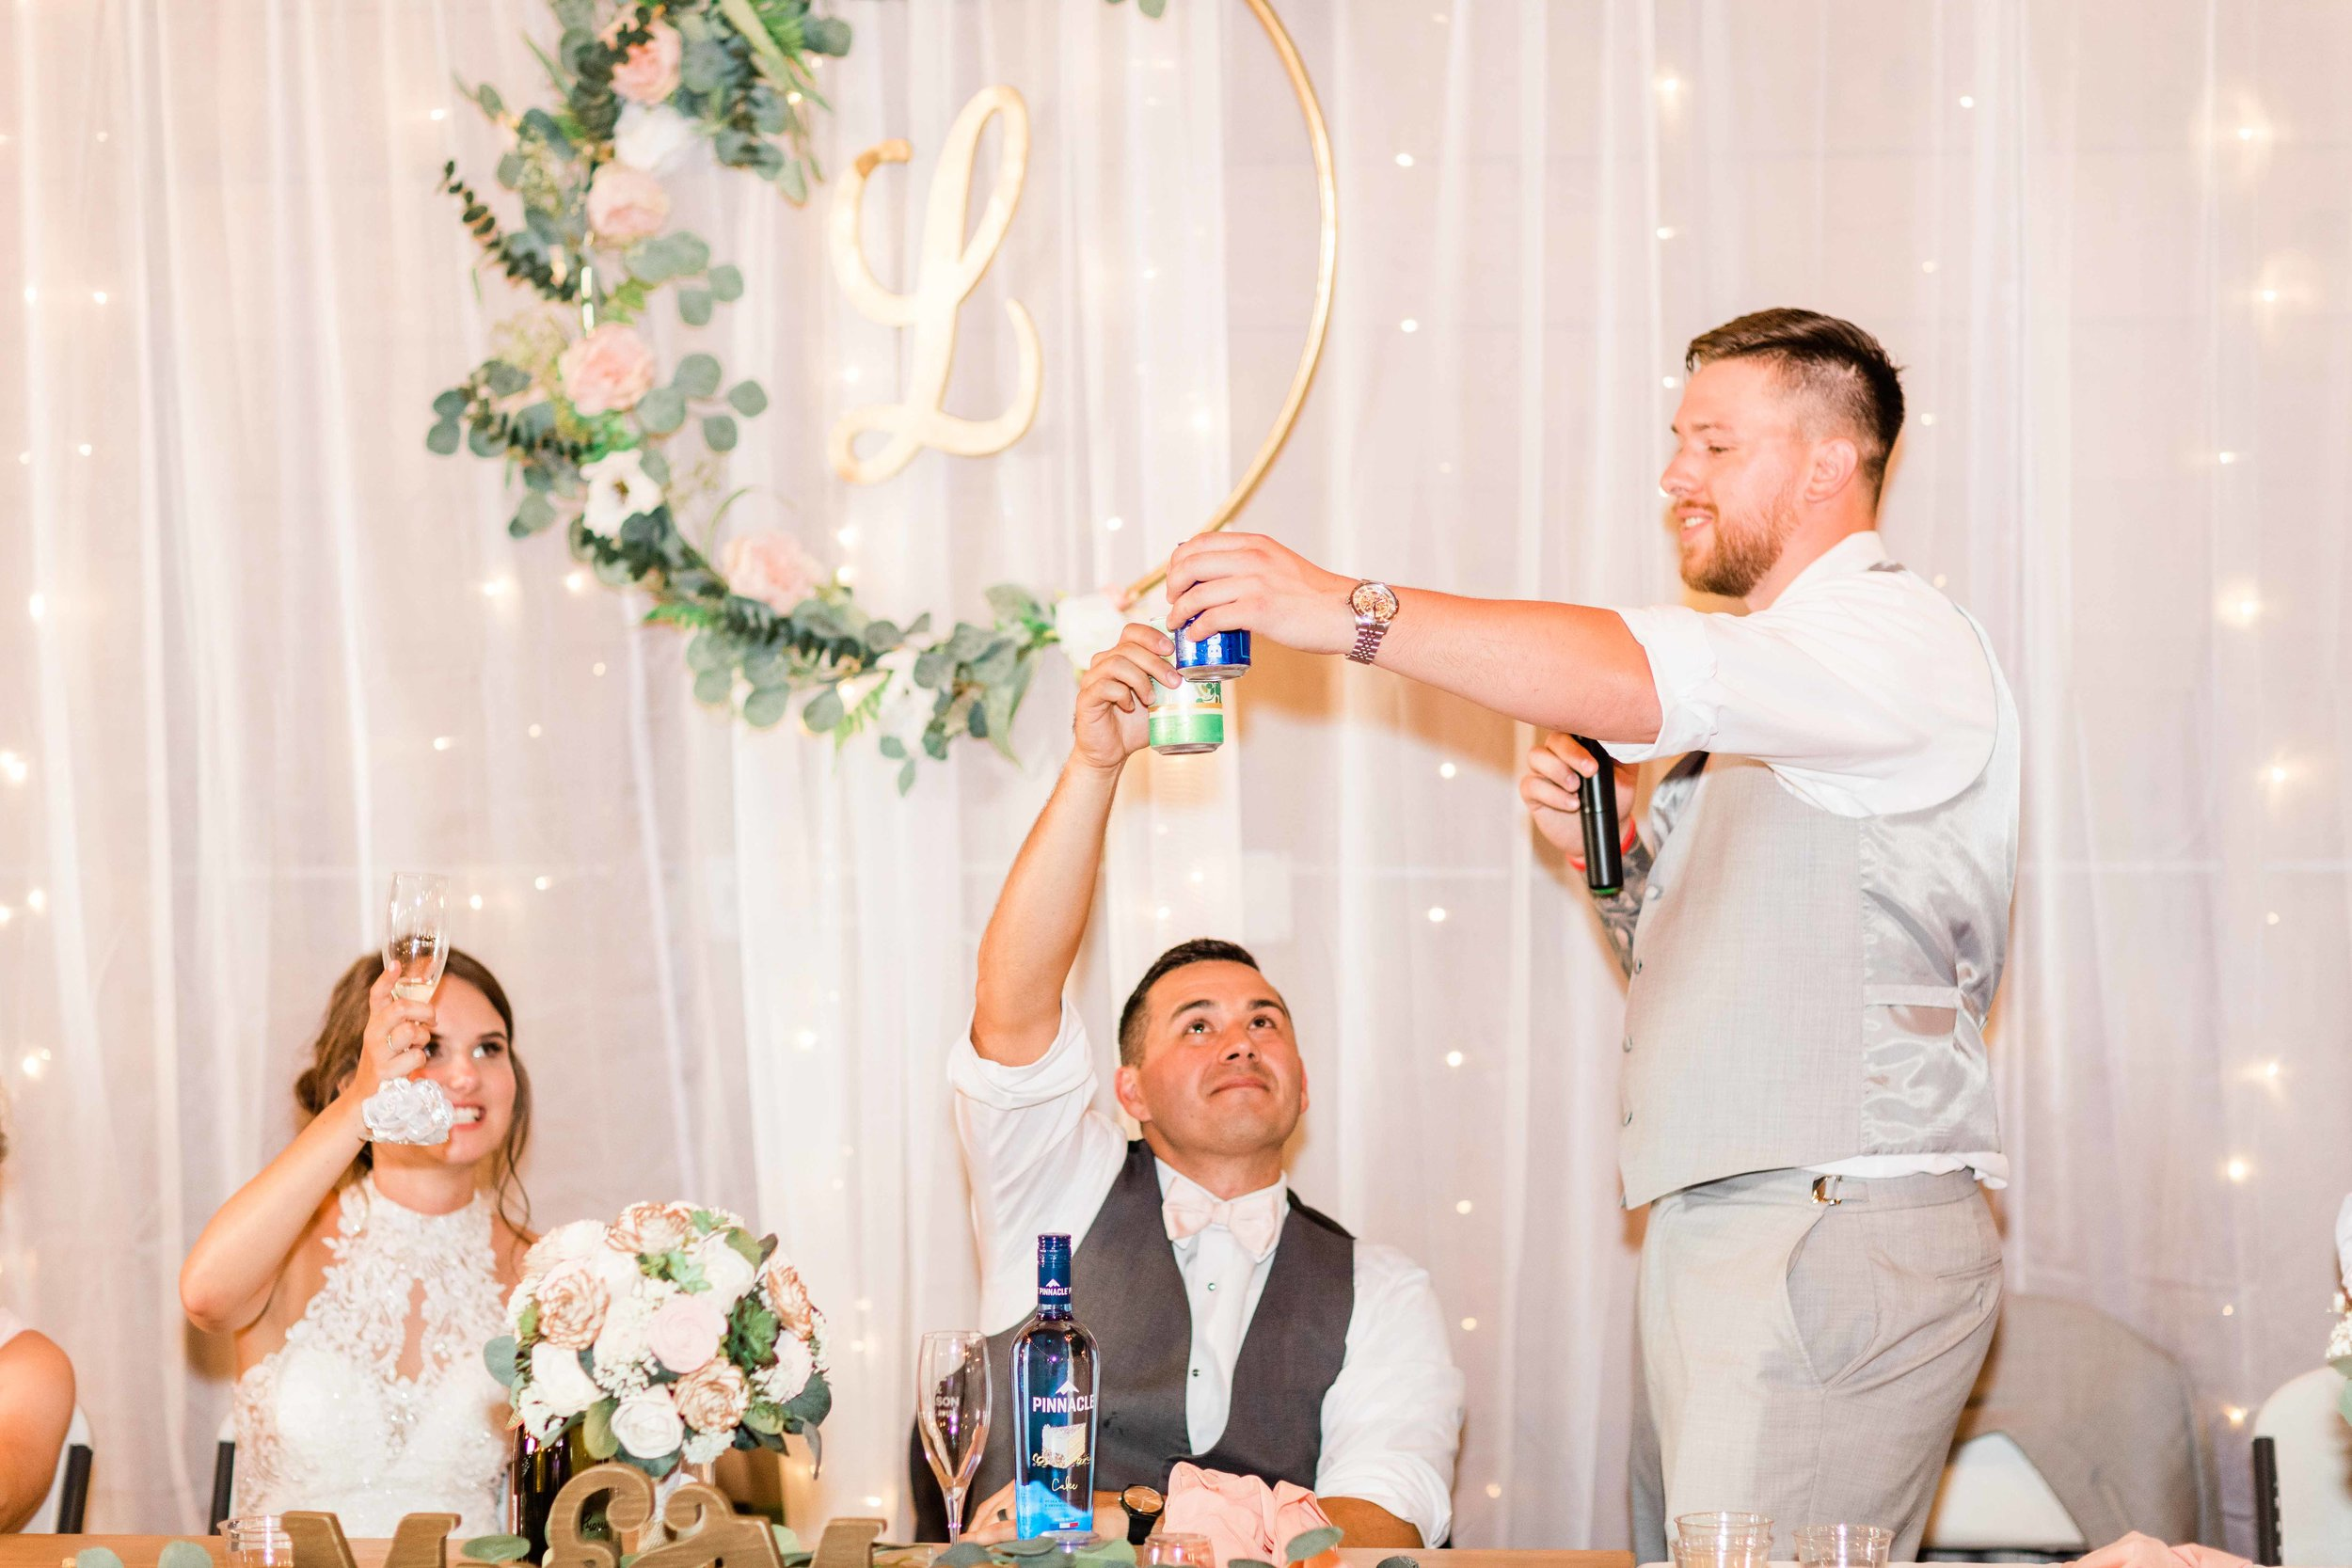 wren farm ohio wedding photography-17.jpg